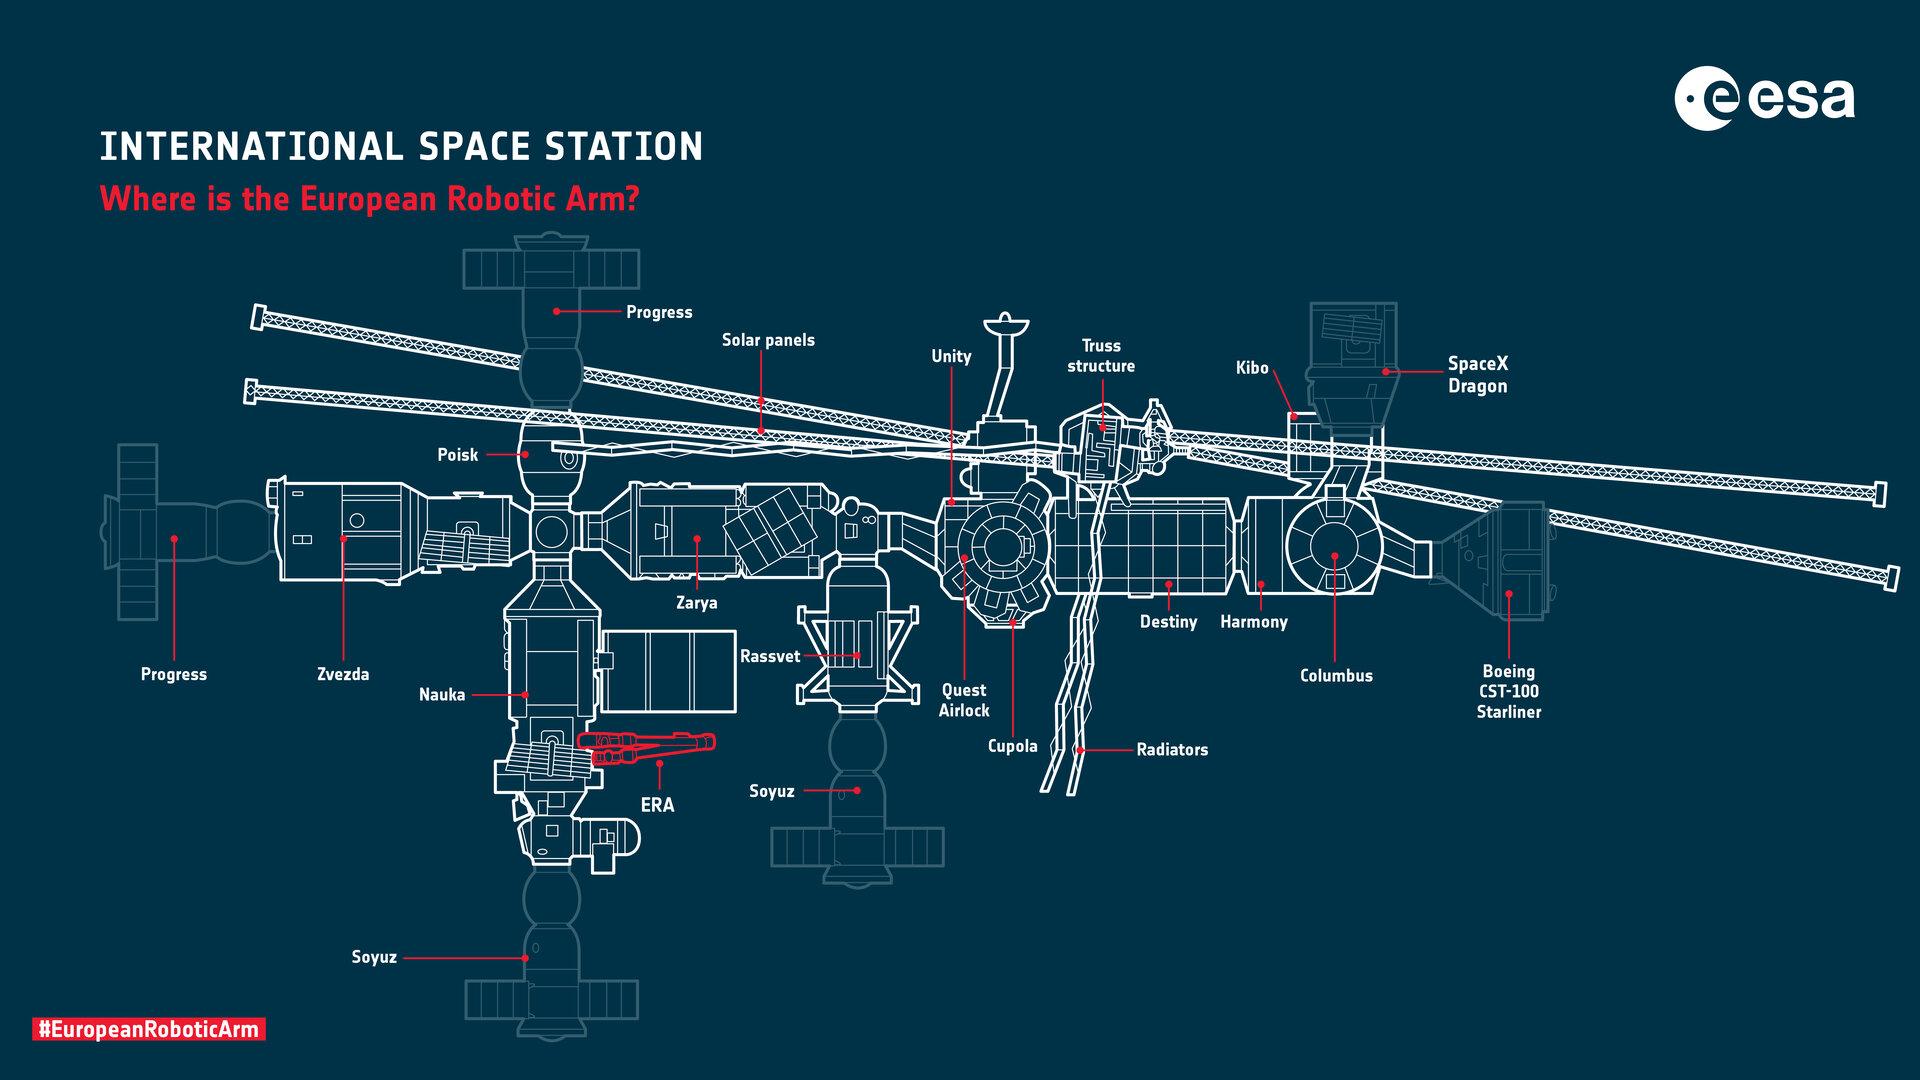 European Robotic Arm on the Space Station pillars